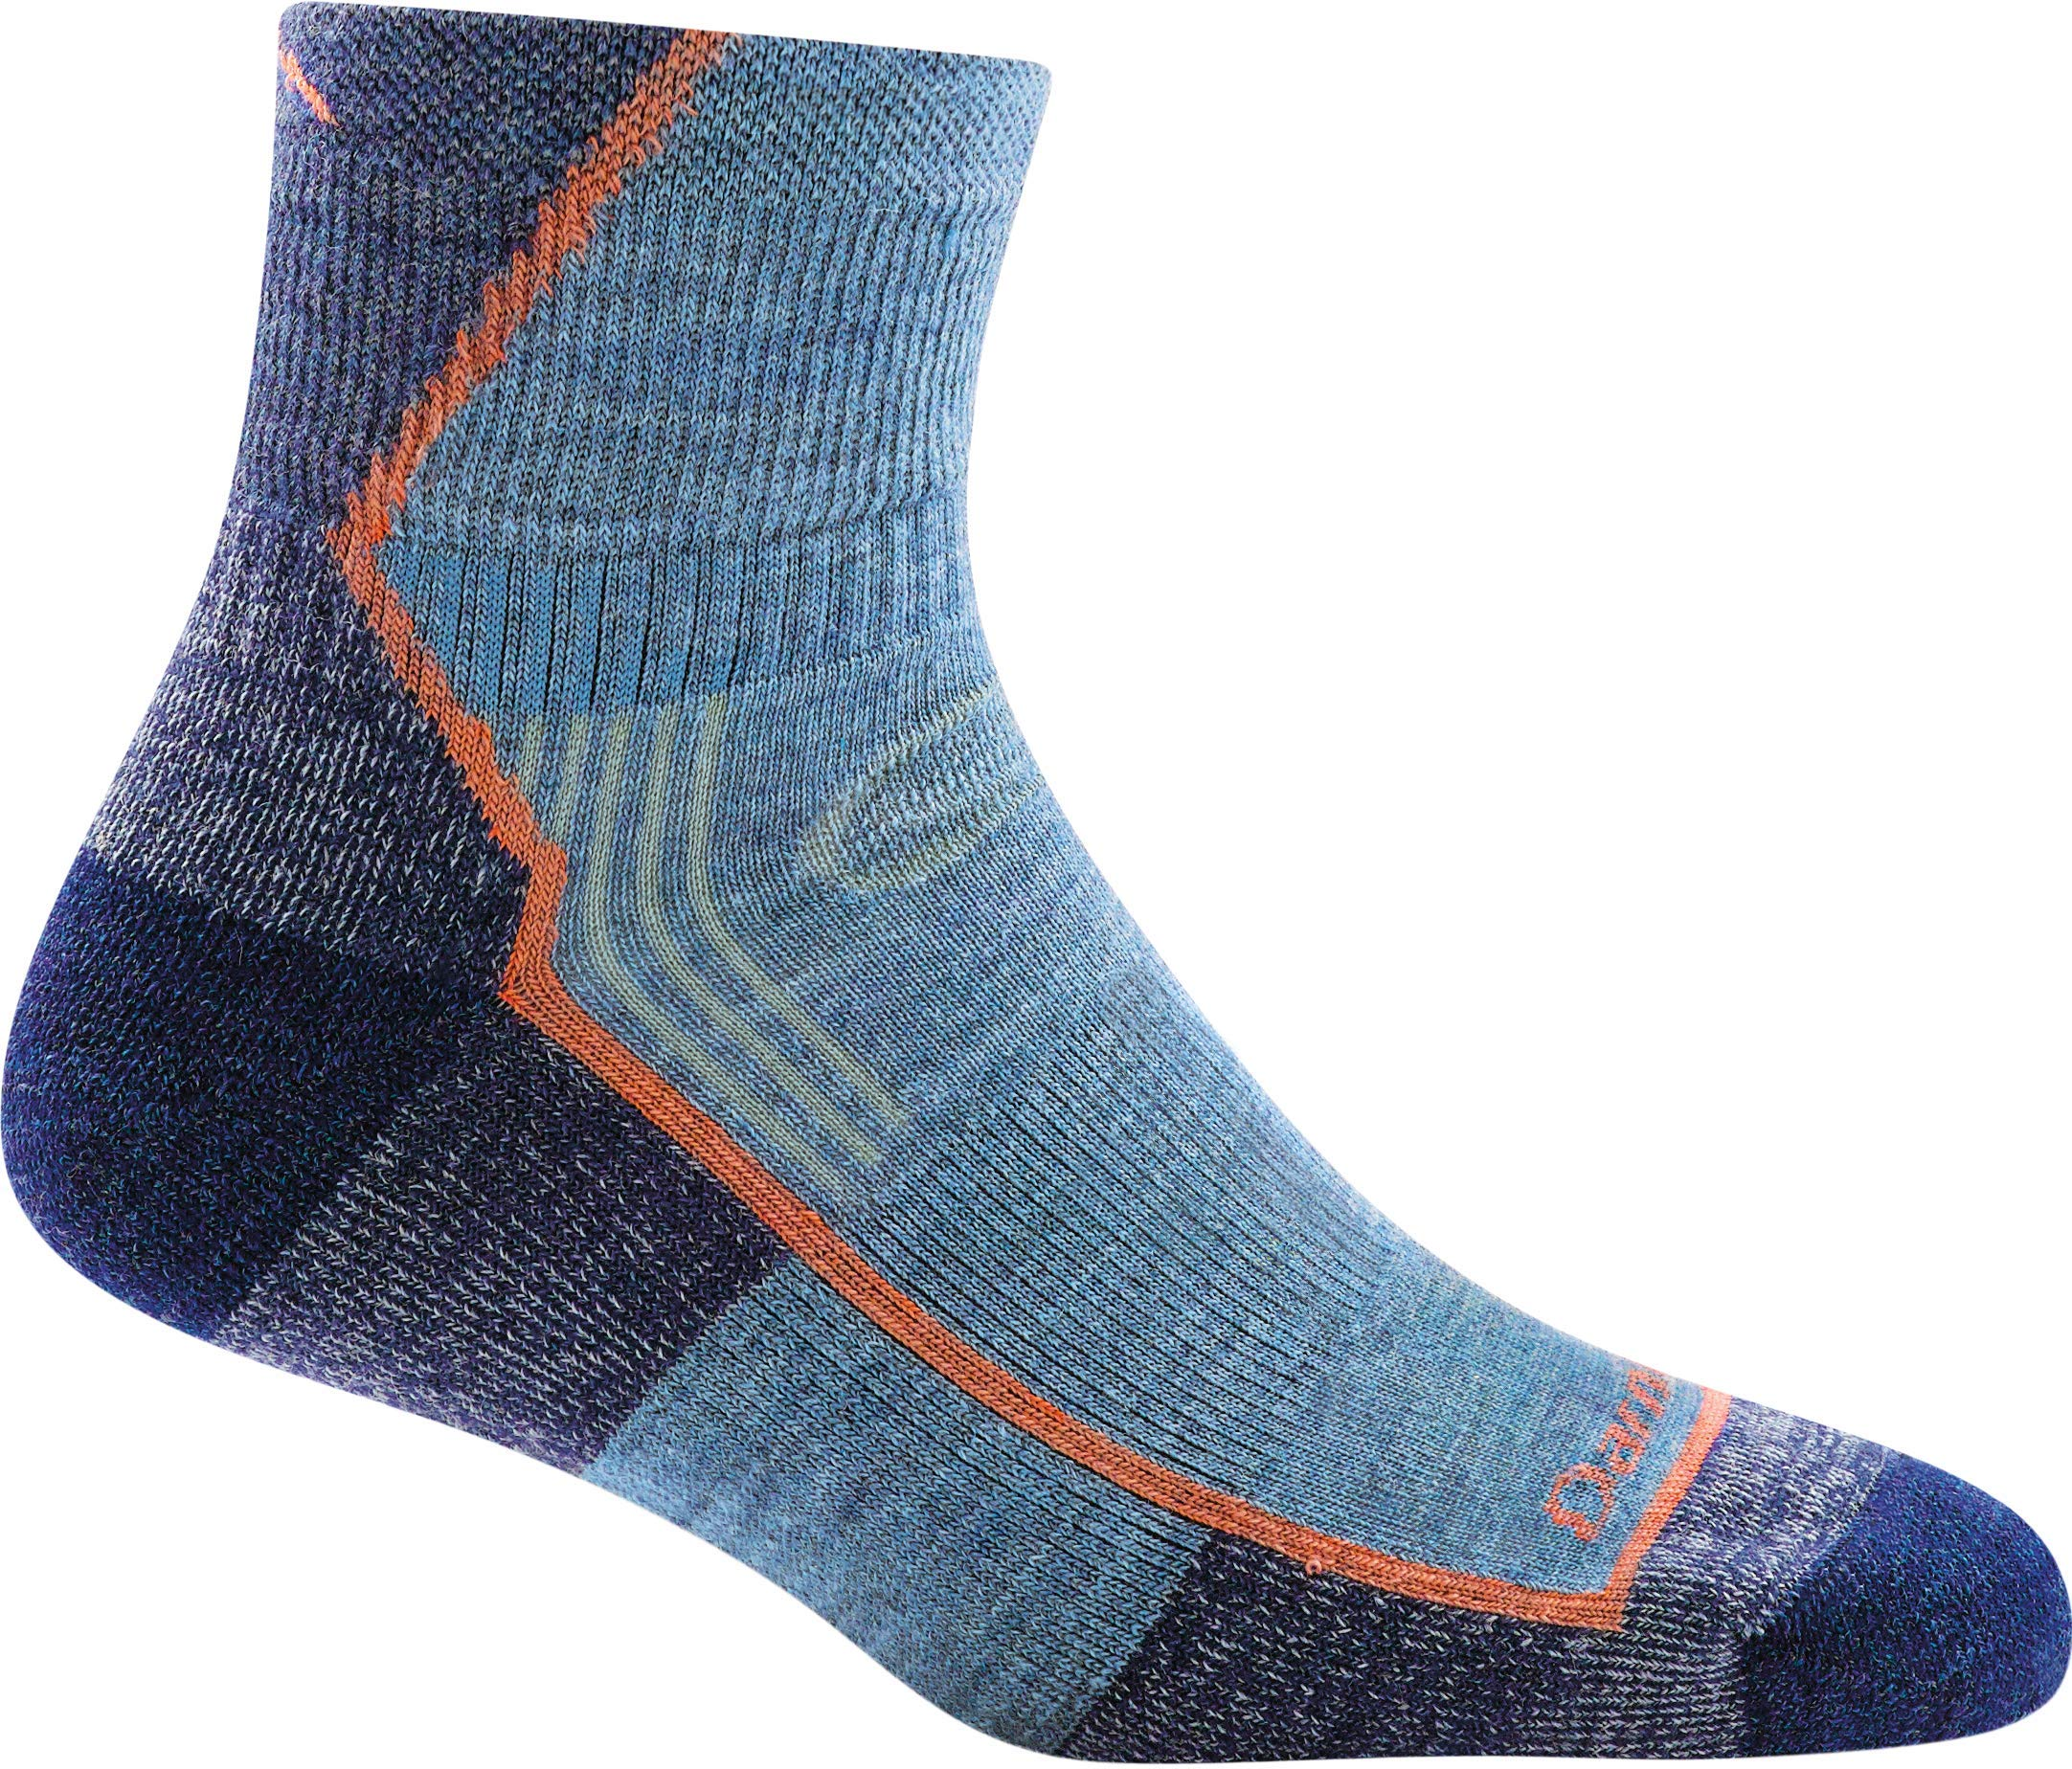 Darn Tough Women's Hiker 1/4 Sock Cushion (Style 1901/1958) Merino Wool - 6 Pack Special (Denim, Medium (7.5-9.5)) by Darn Tough